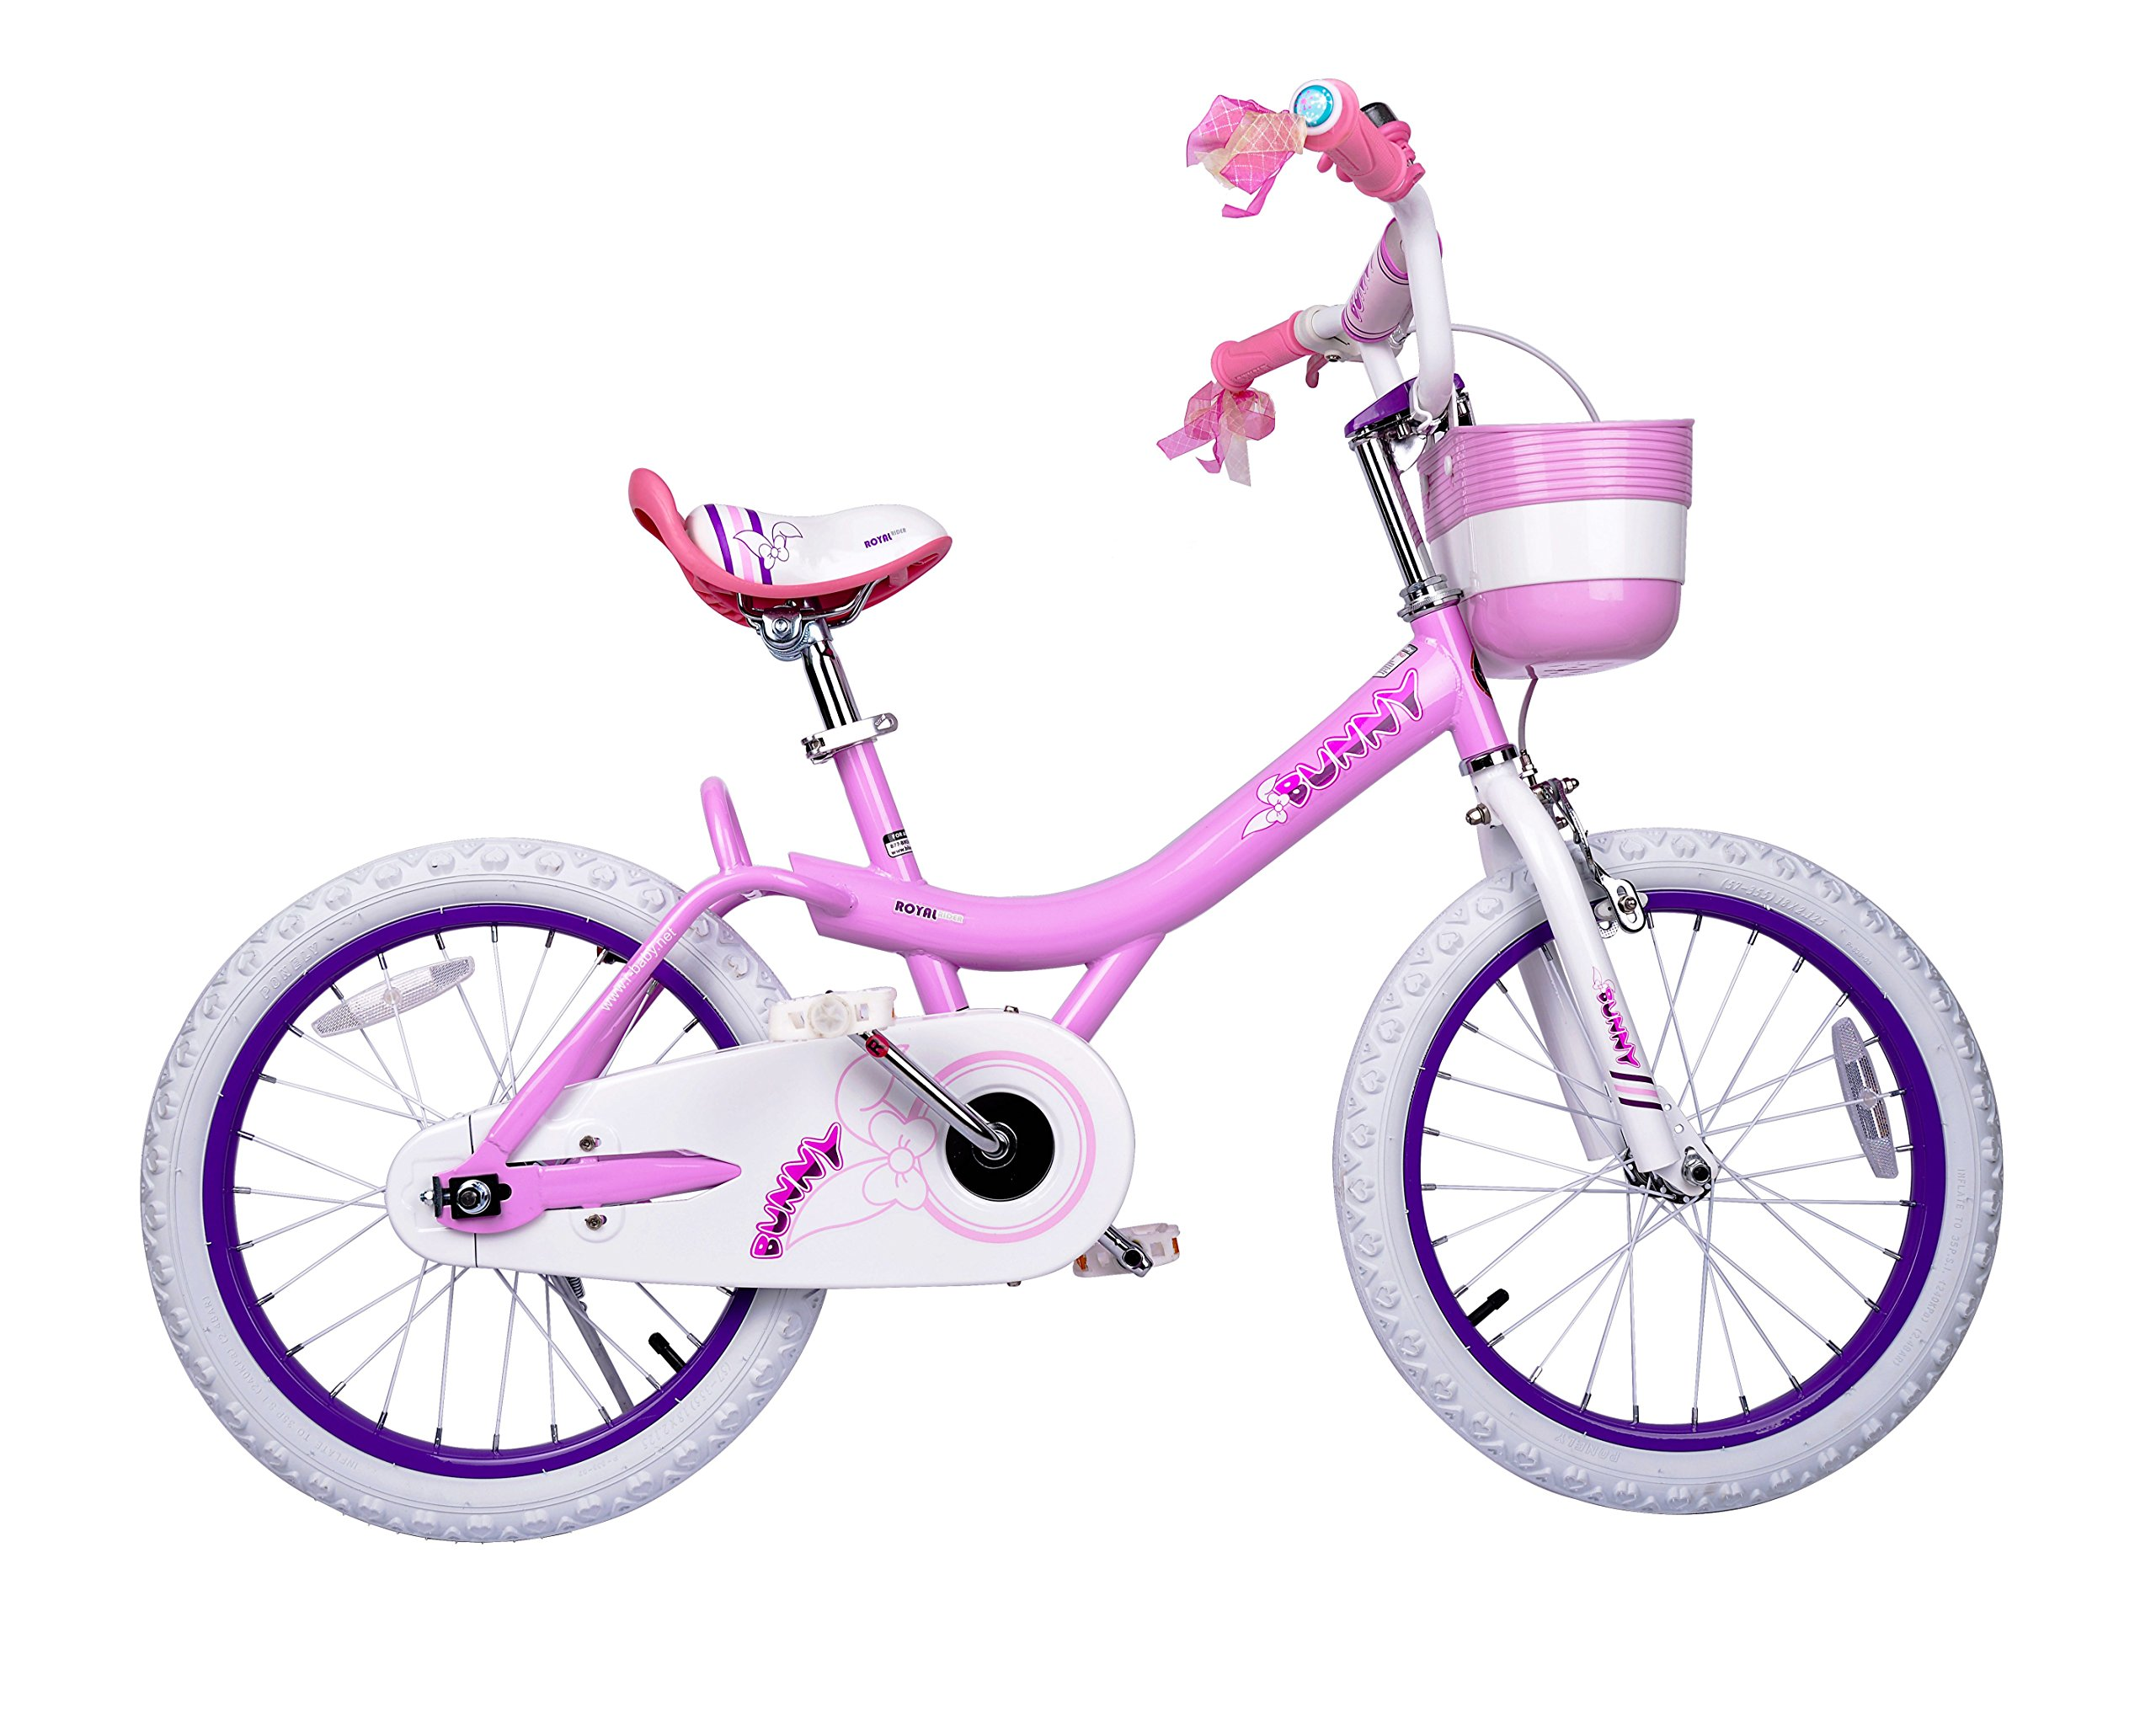 Royalbaby Bunny Girl's Bike Pink 12 inch Kid's bicycle